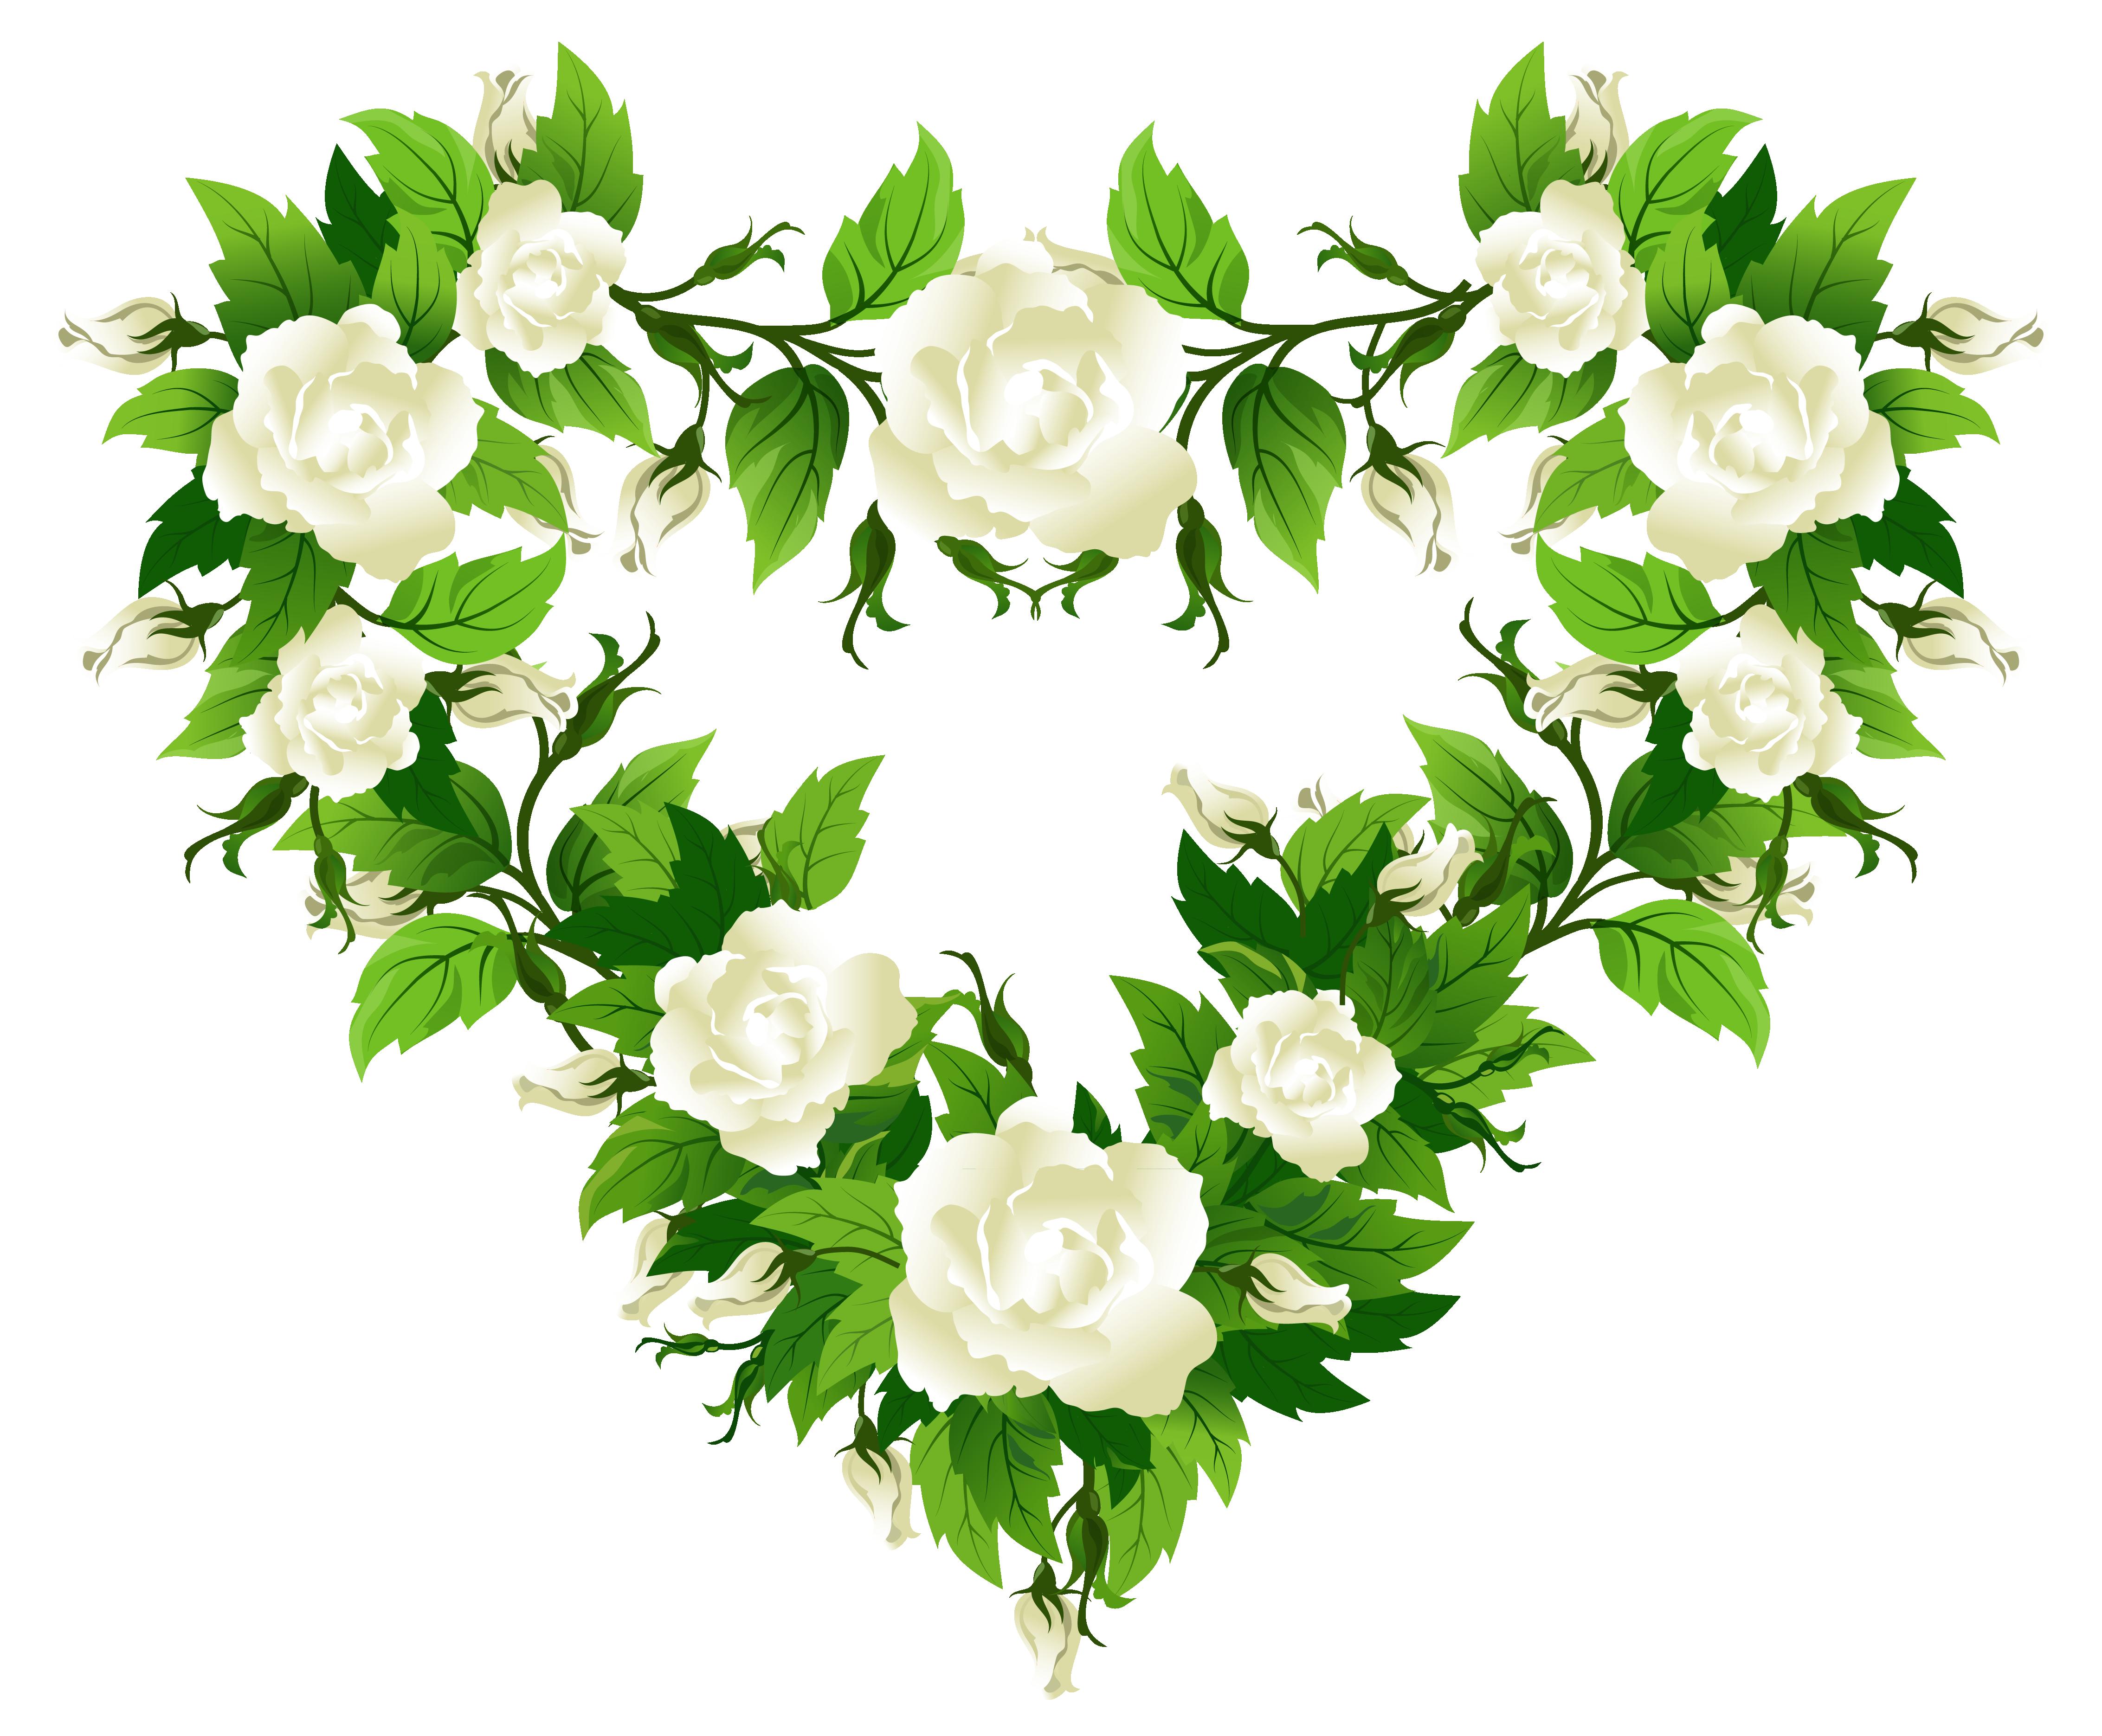 Circle clipart rose. White roses heart decor